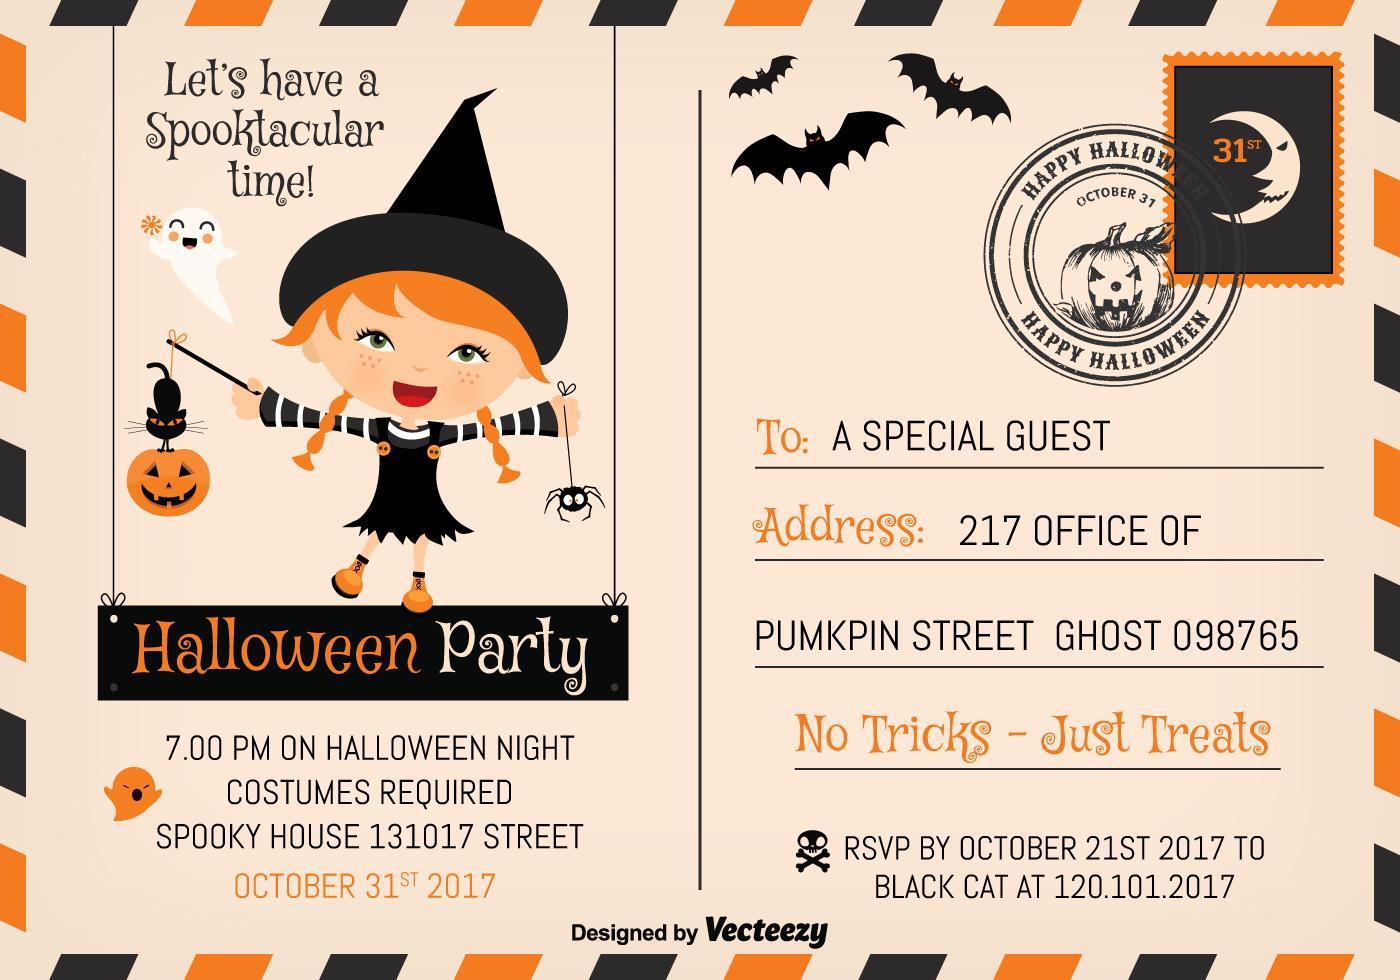 Cute Halloween Party 2017 Invitation Postcard Vector Template ...